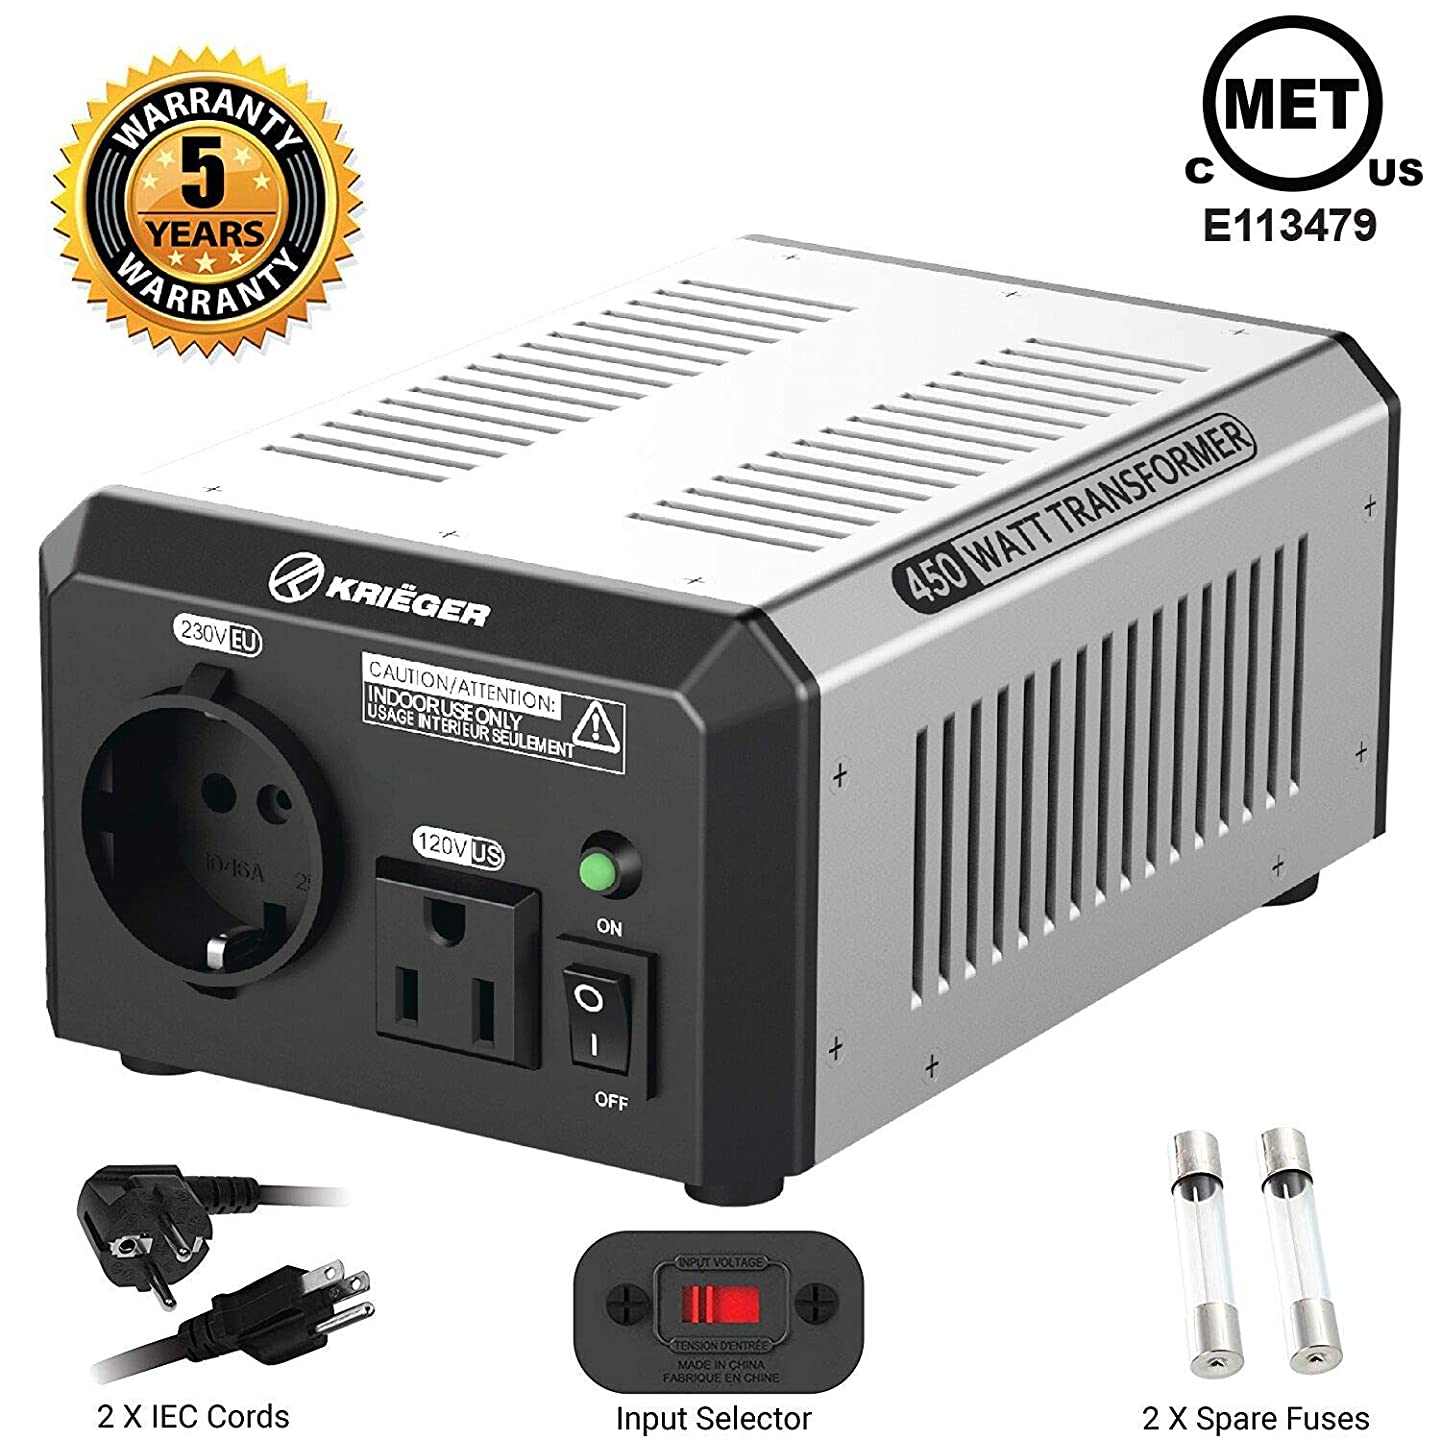 KRI?GER 450 Watt Voltage Transformer, 110/120V to 220/240V Step Up Step Down Voltage Converter, MET Approved Under UL, CSA